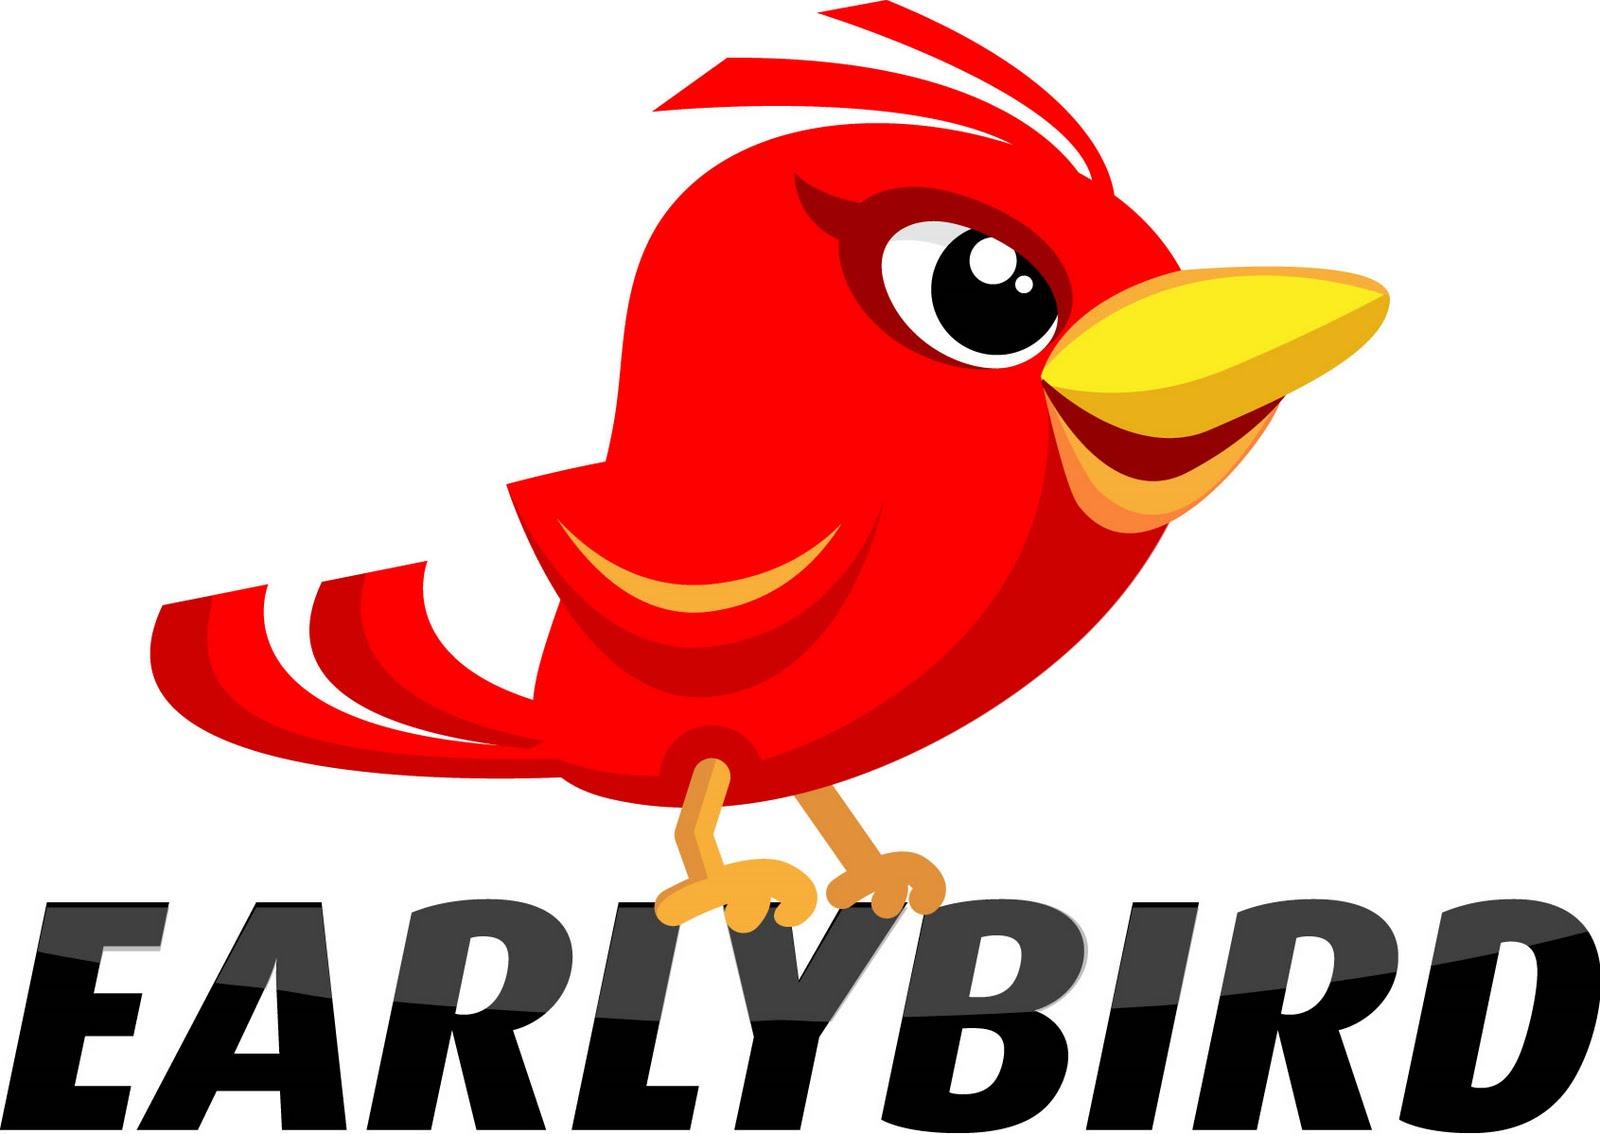 1600x1134 8d9dc6b24b4127b16a74e362095017a4 Early Bird Clip Art Early Bird